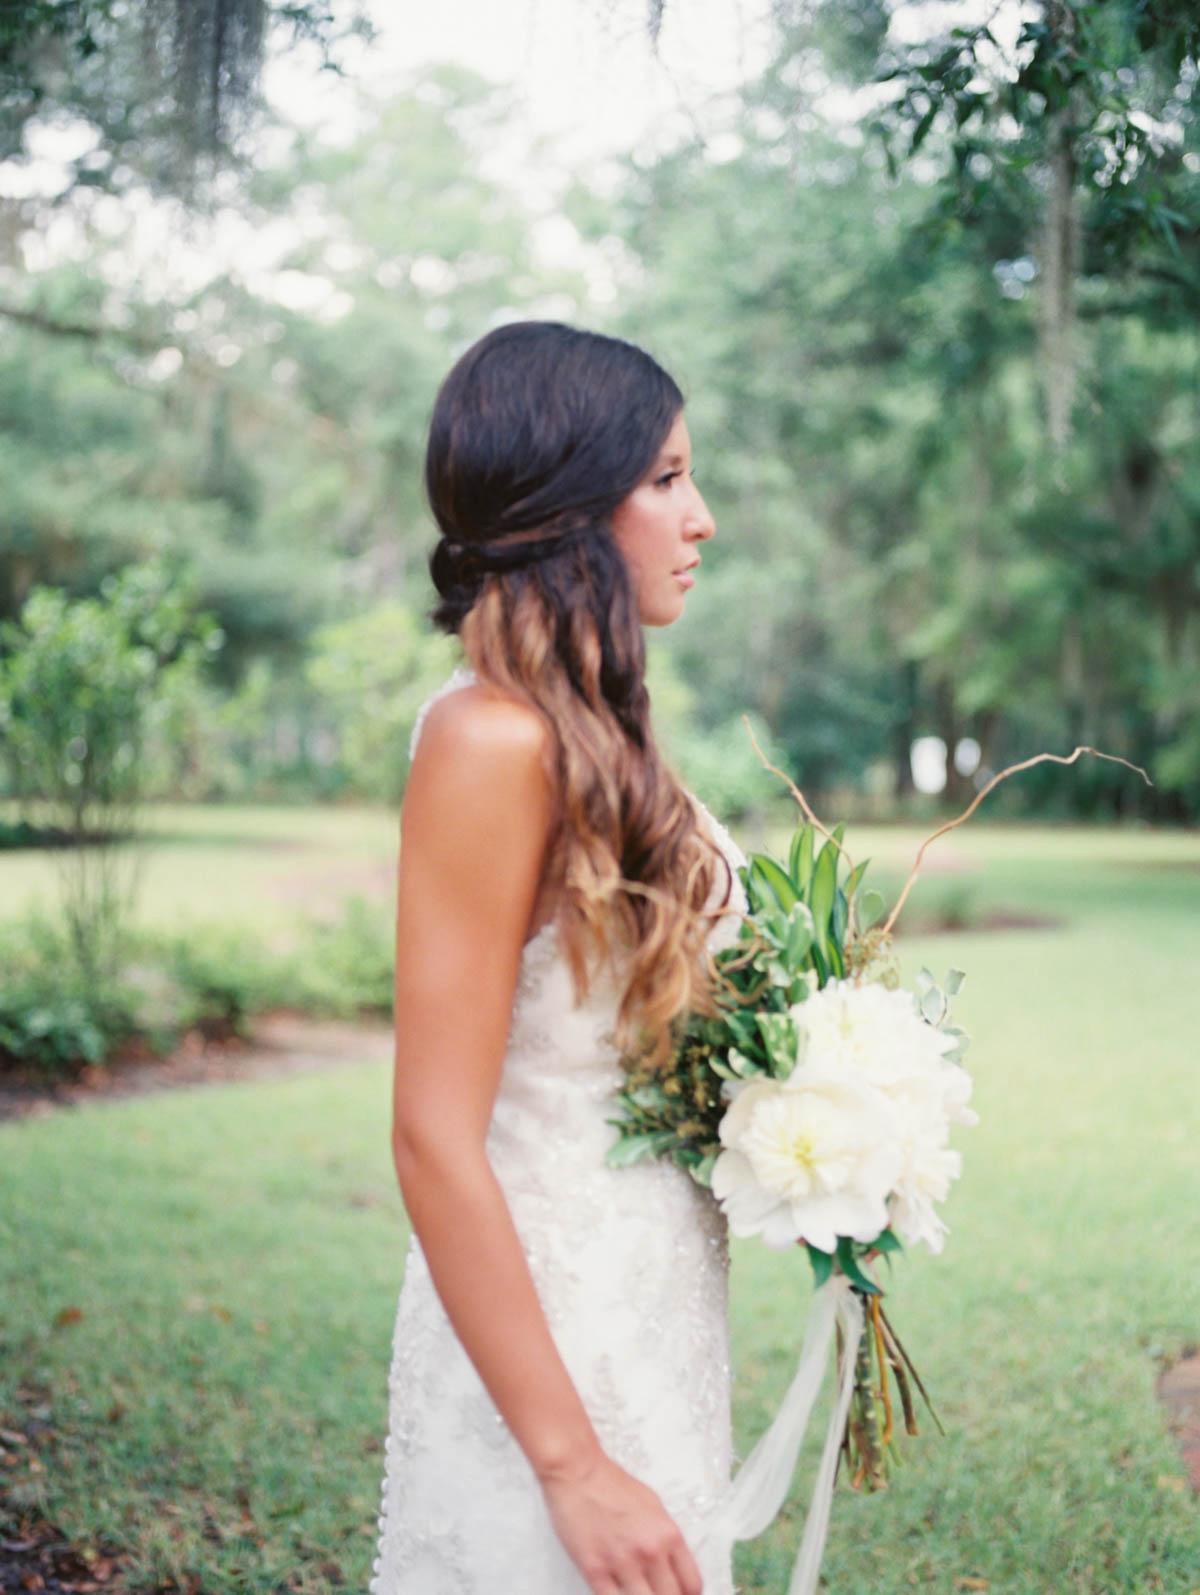 edengardens-wedding-kayliebpoplinphotography-16.jpg